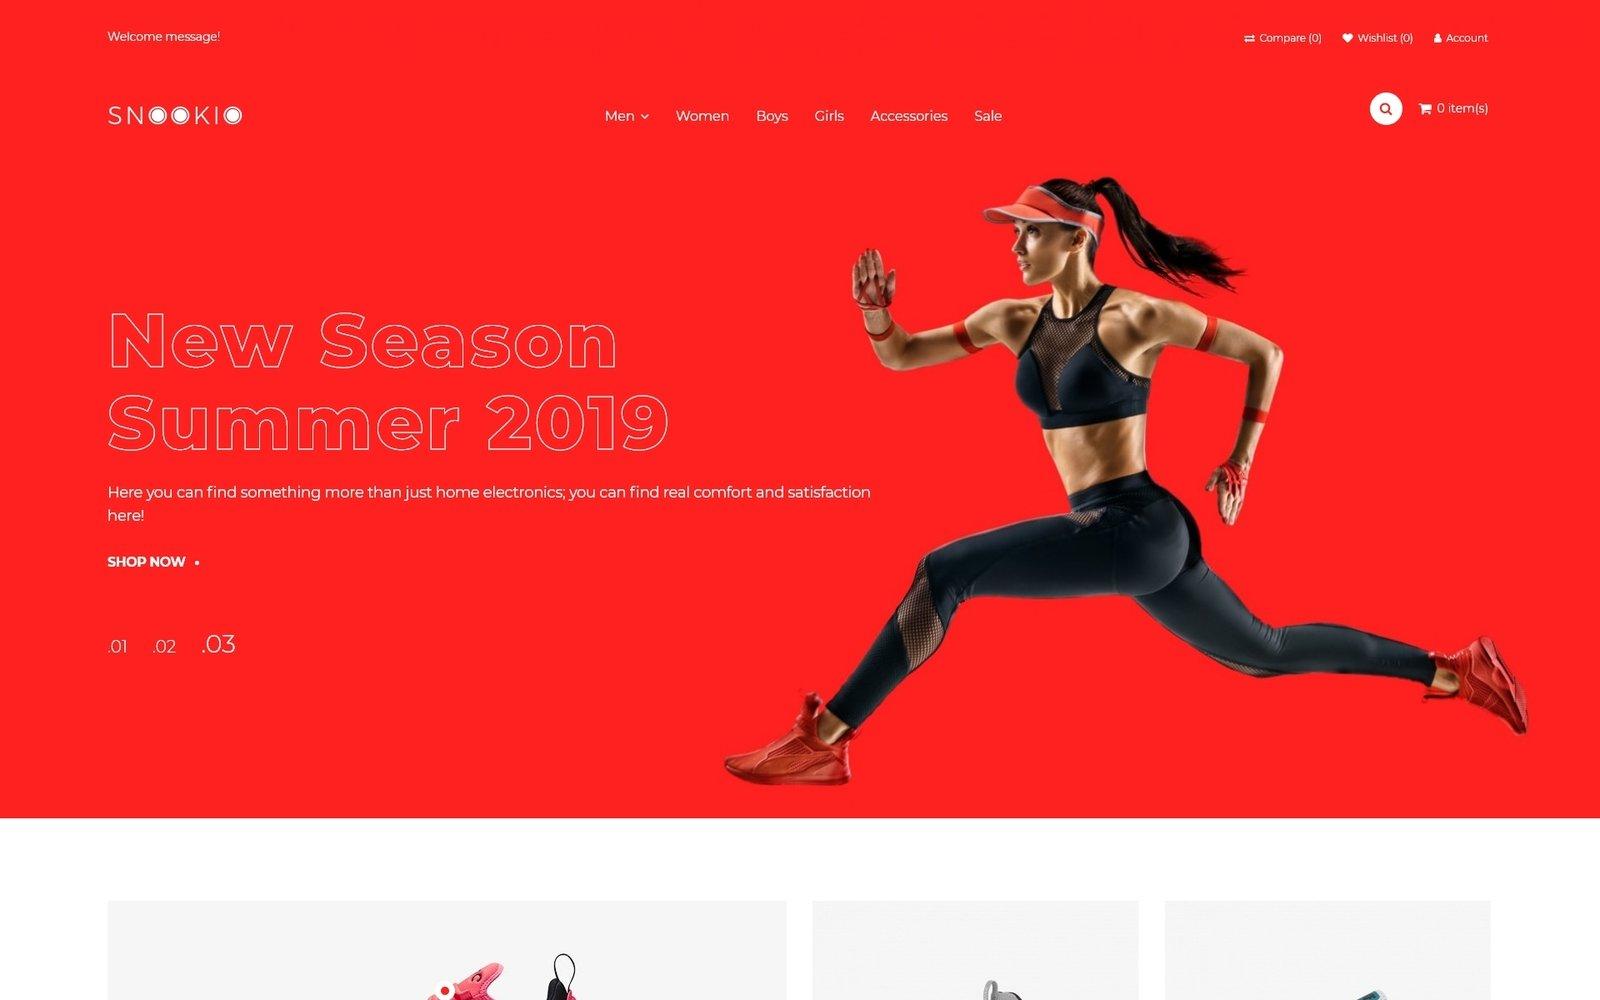 Reszponzív Snookio - Shoe Store eCommerce Clean OpenCart sablon 81084 - képernyőkép